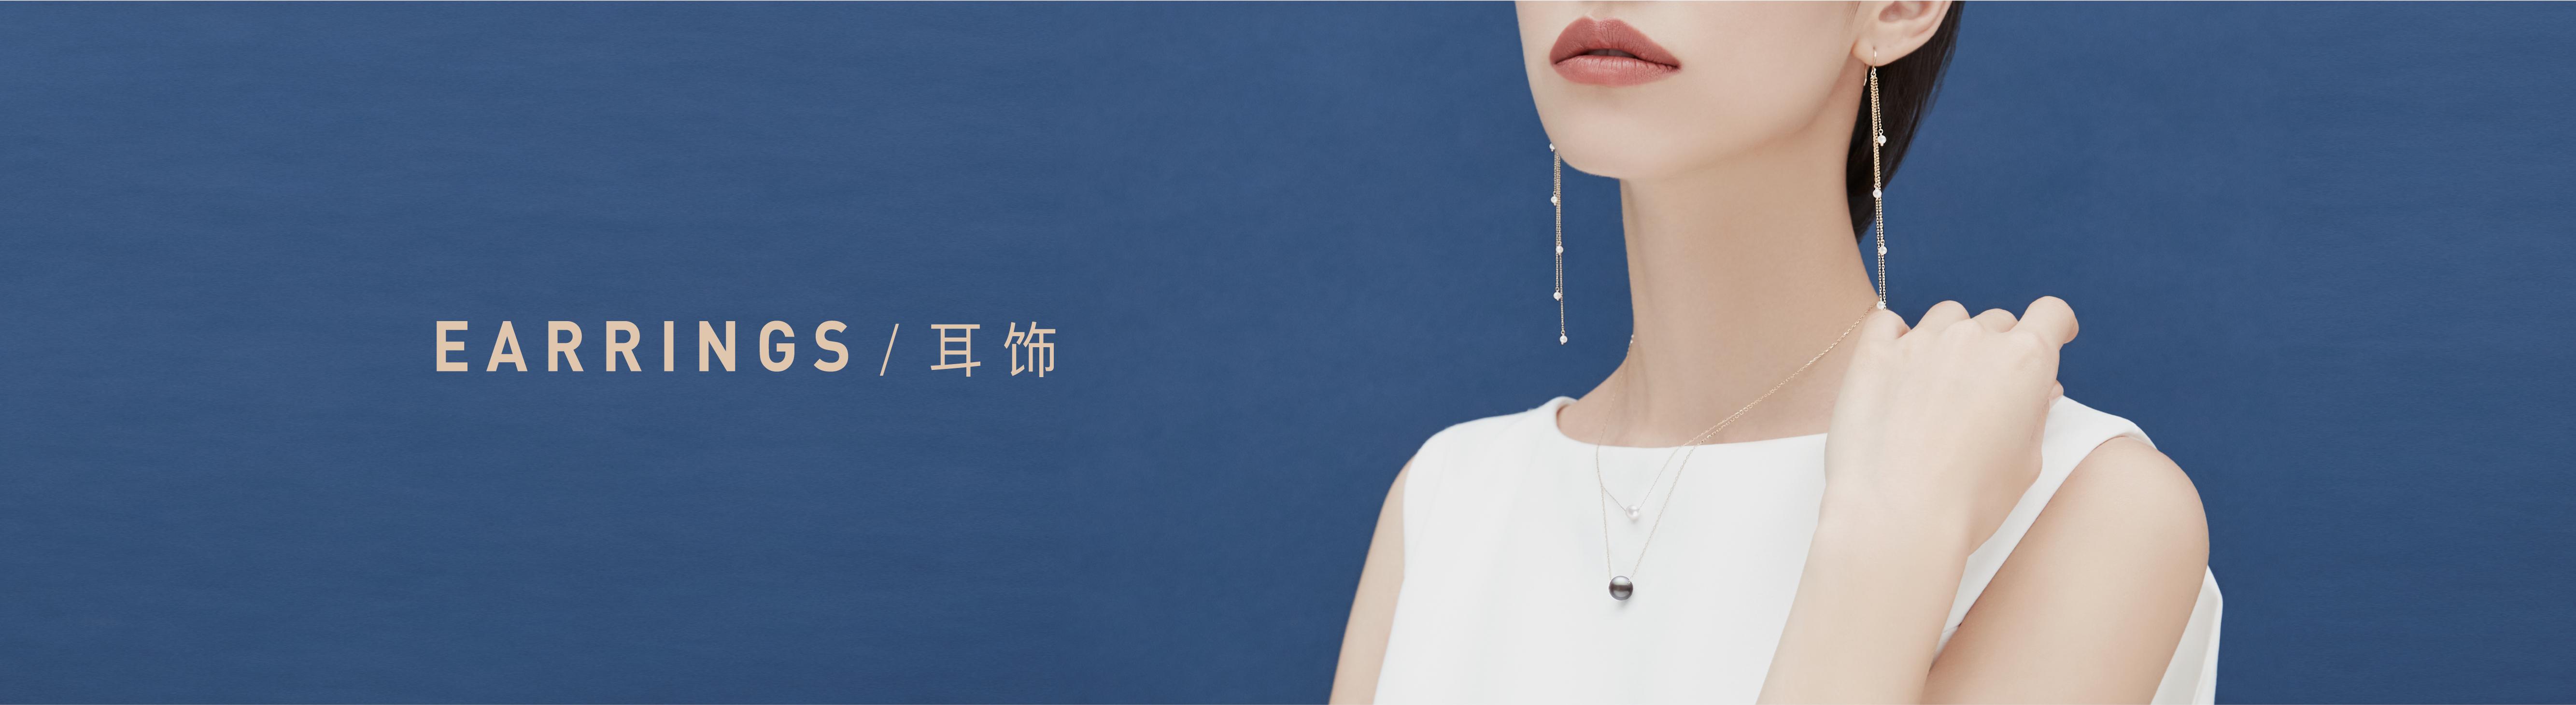 web 配图 - 产品分类_耳饰